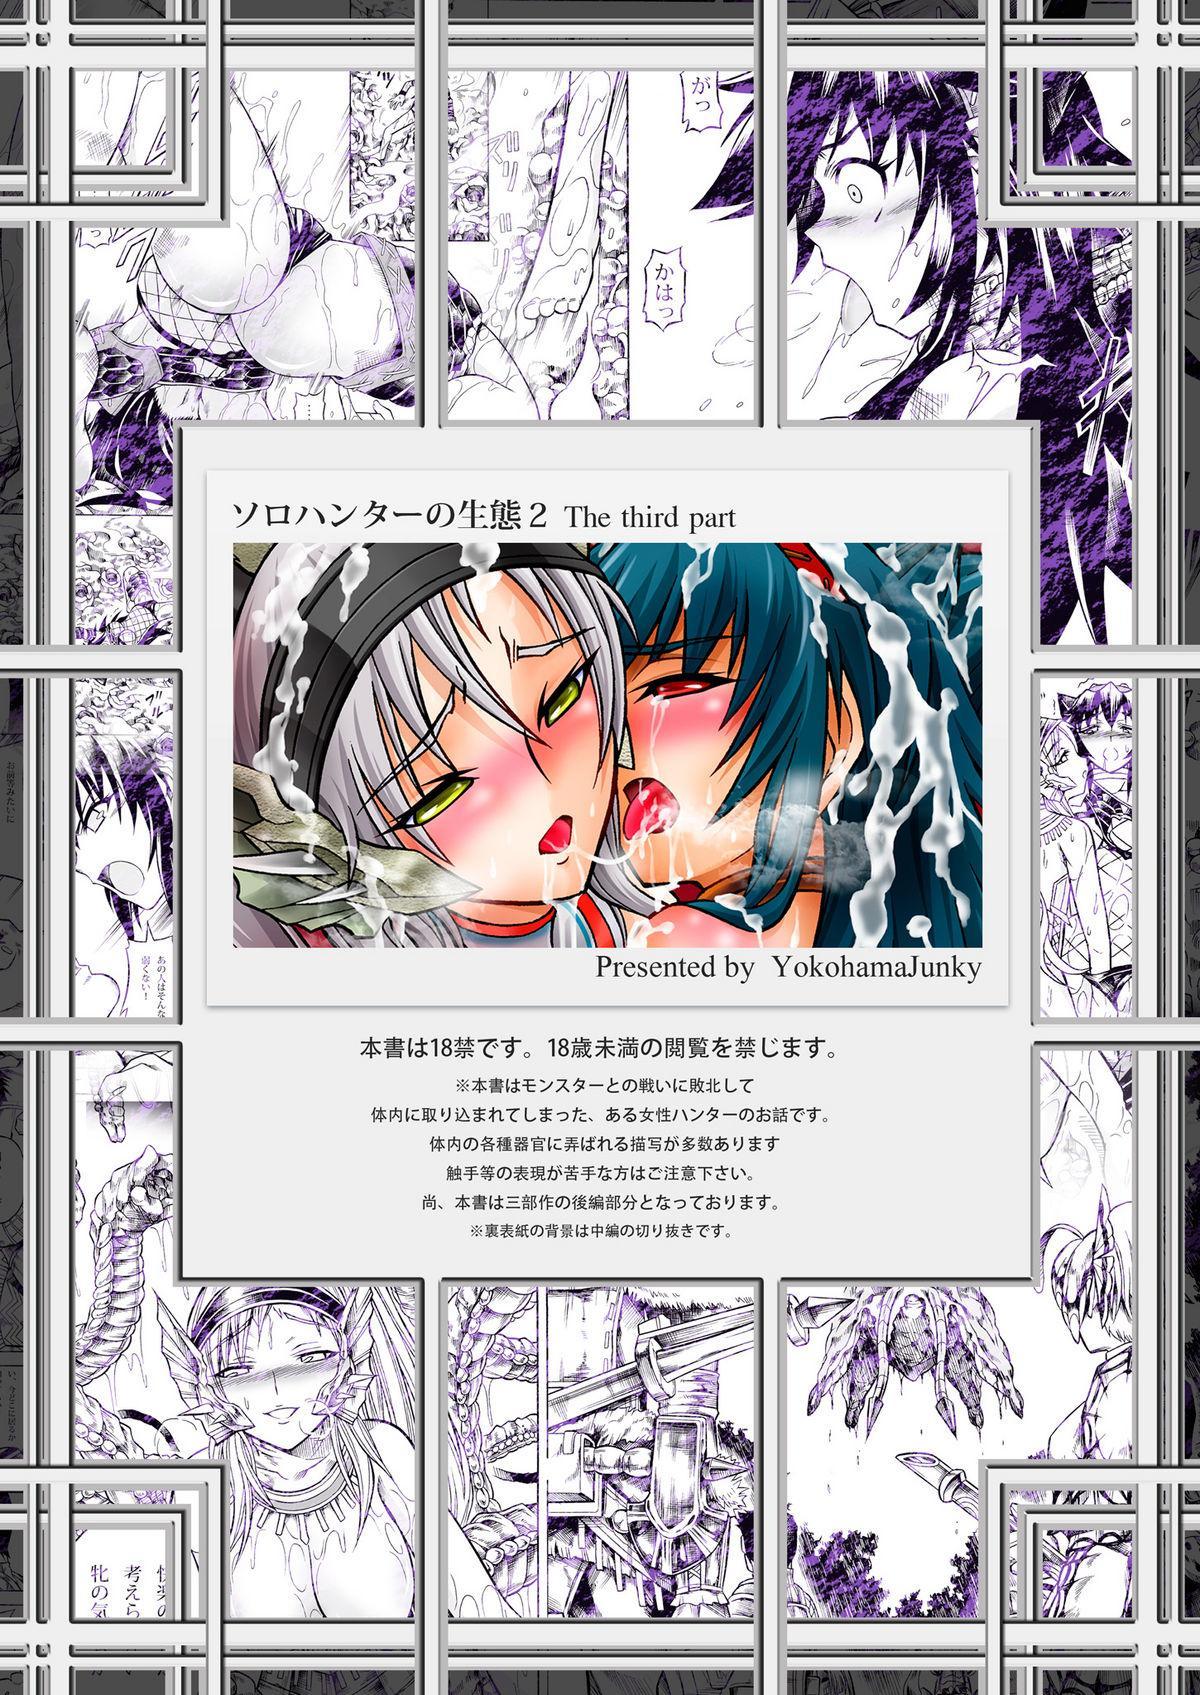 Solo Hunter no Seitai 2 The third part 47